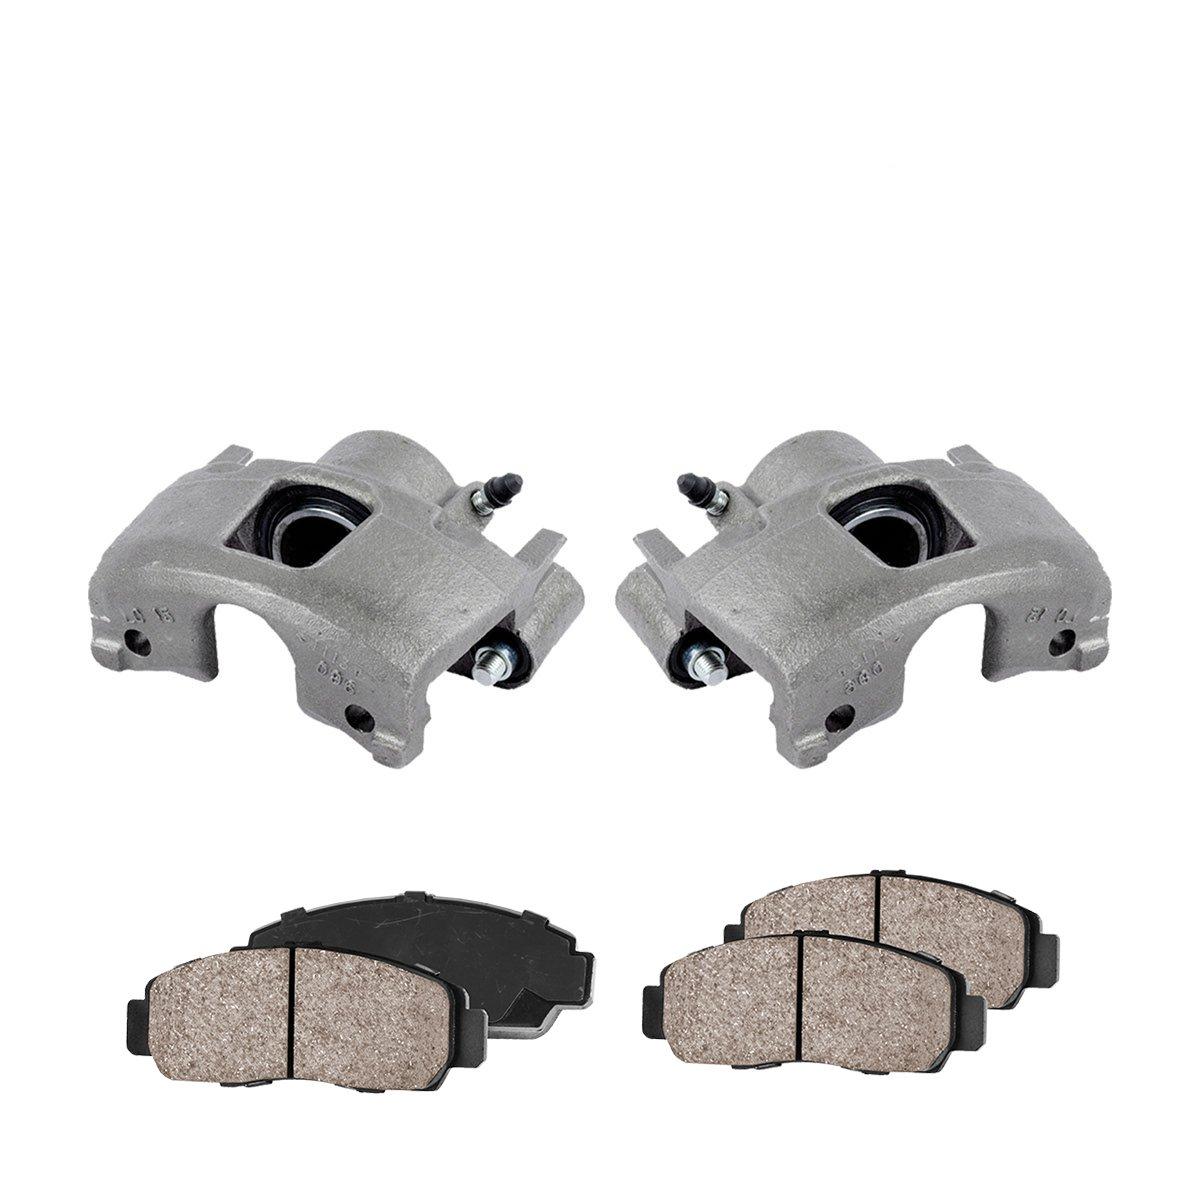 2 Quiet Low Dust Ceramic Brake Pads CCK11345 FRONT Premium Loaded OE Caliper Assembly Set